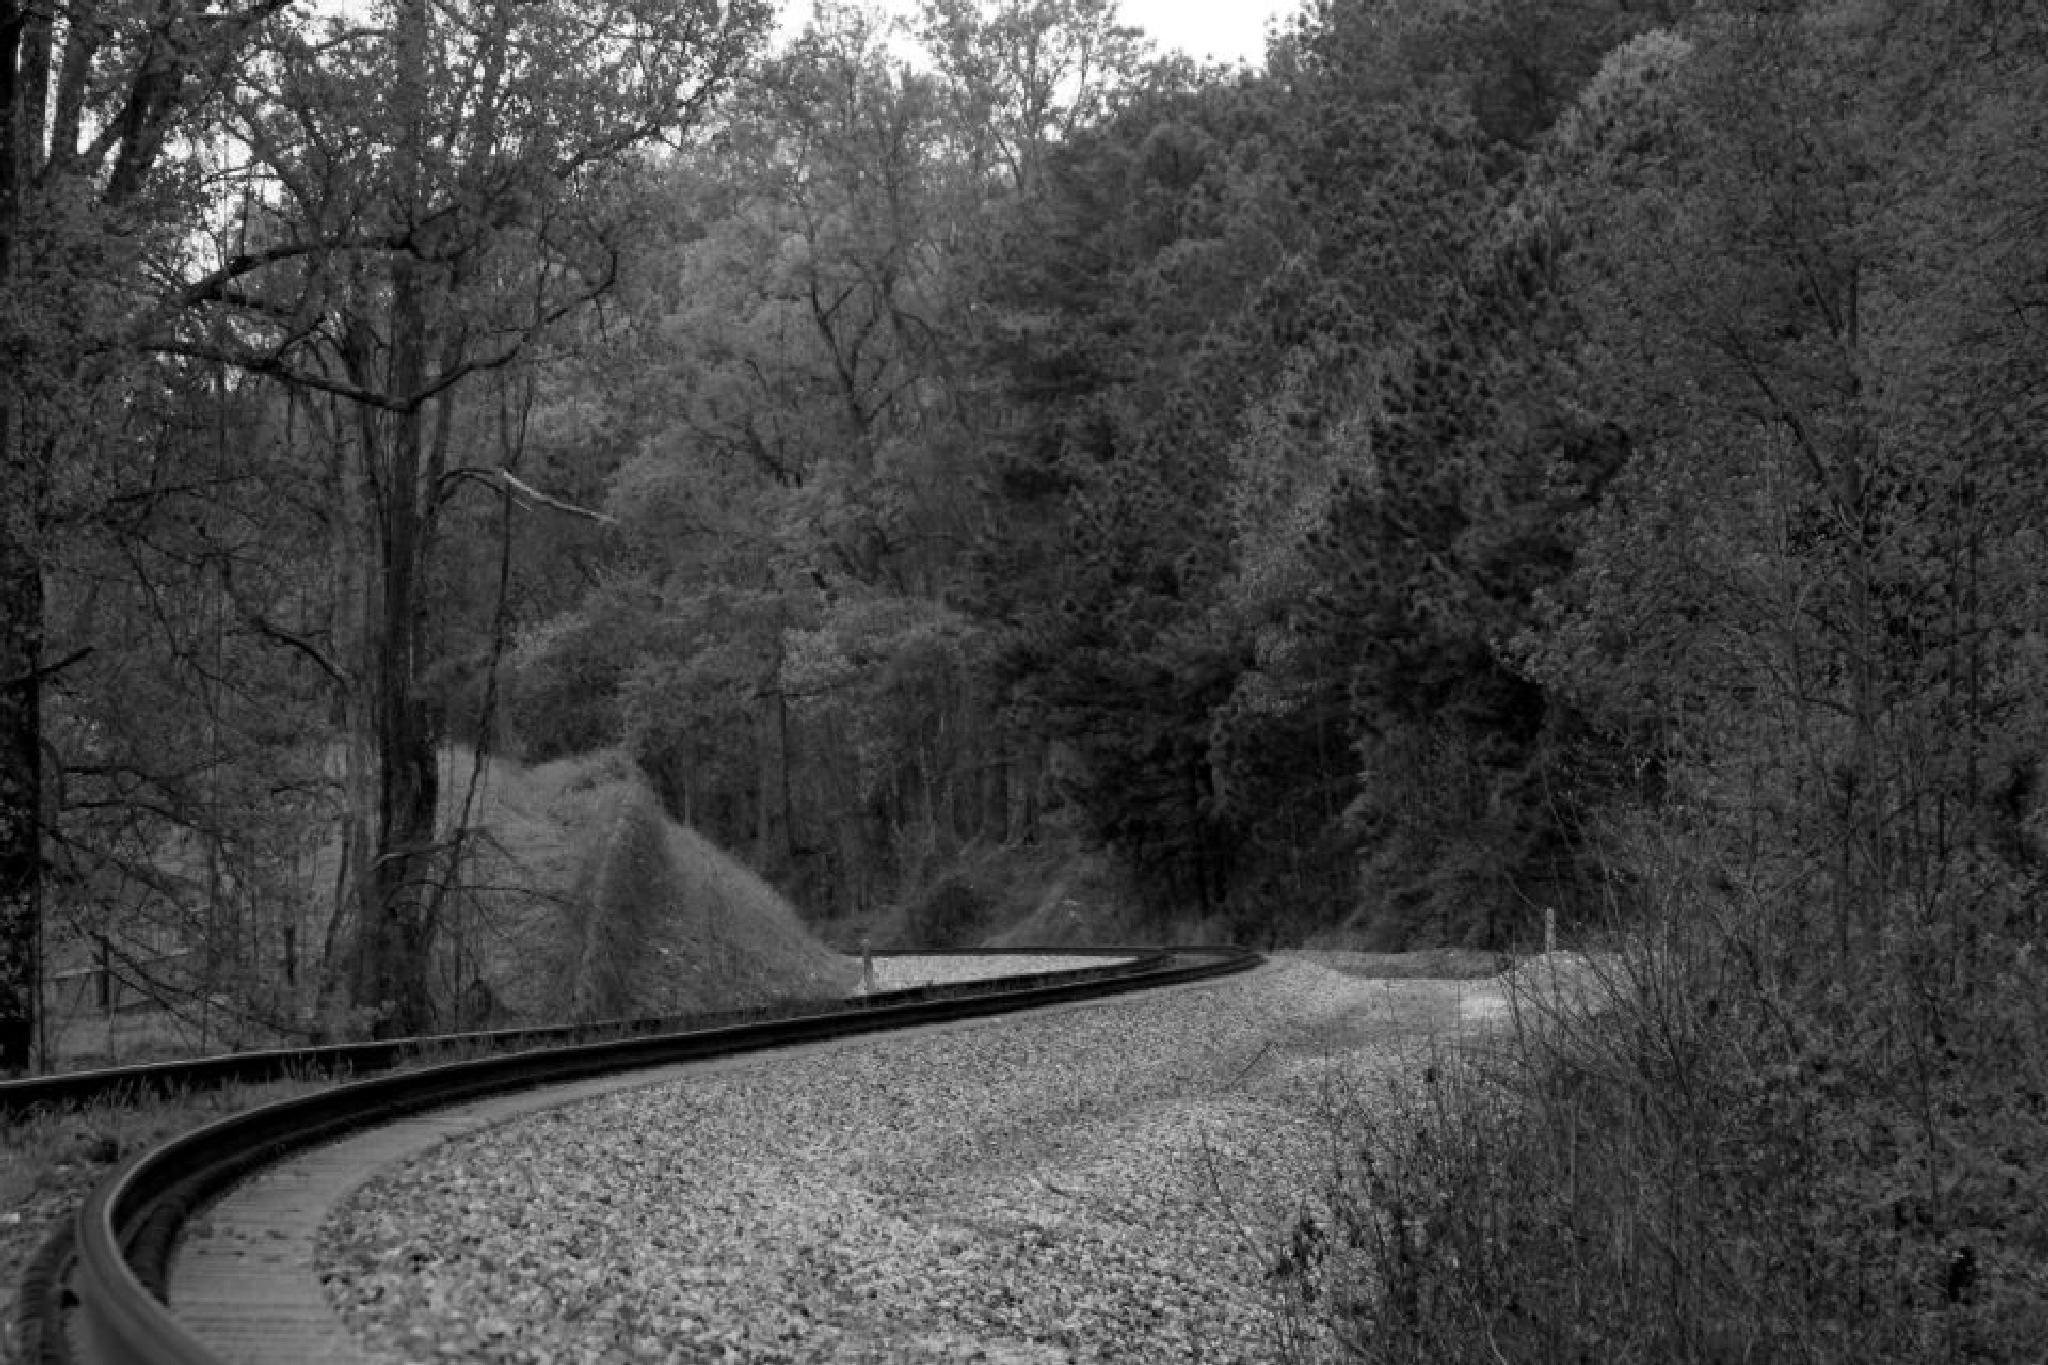 Georgia railroad by Nancy Kenney